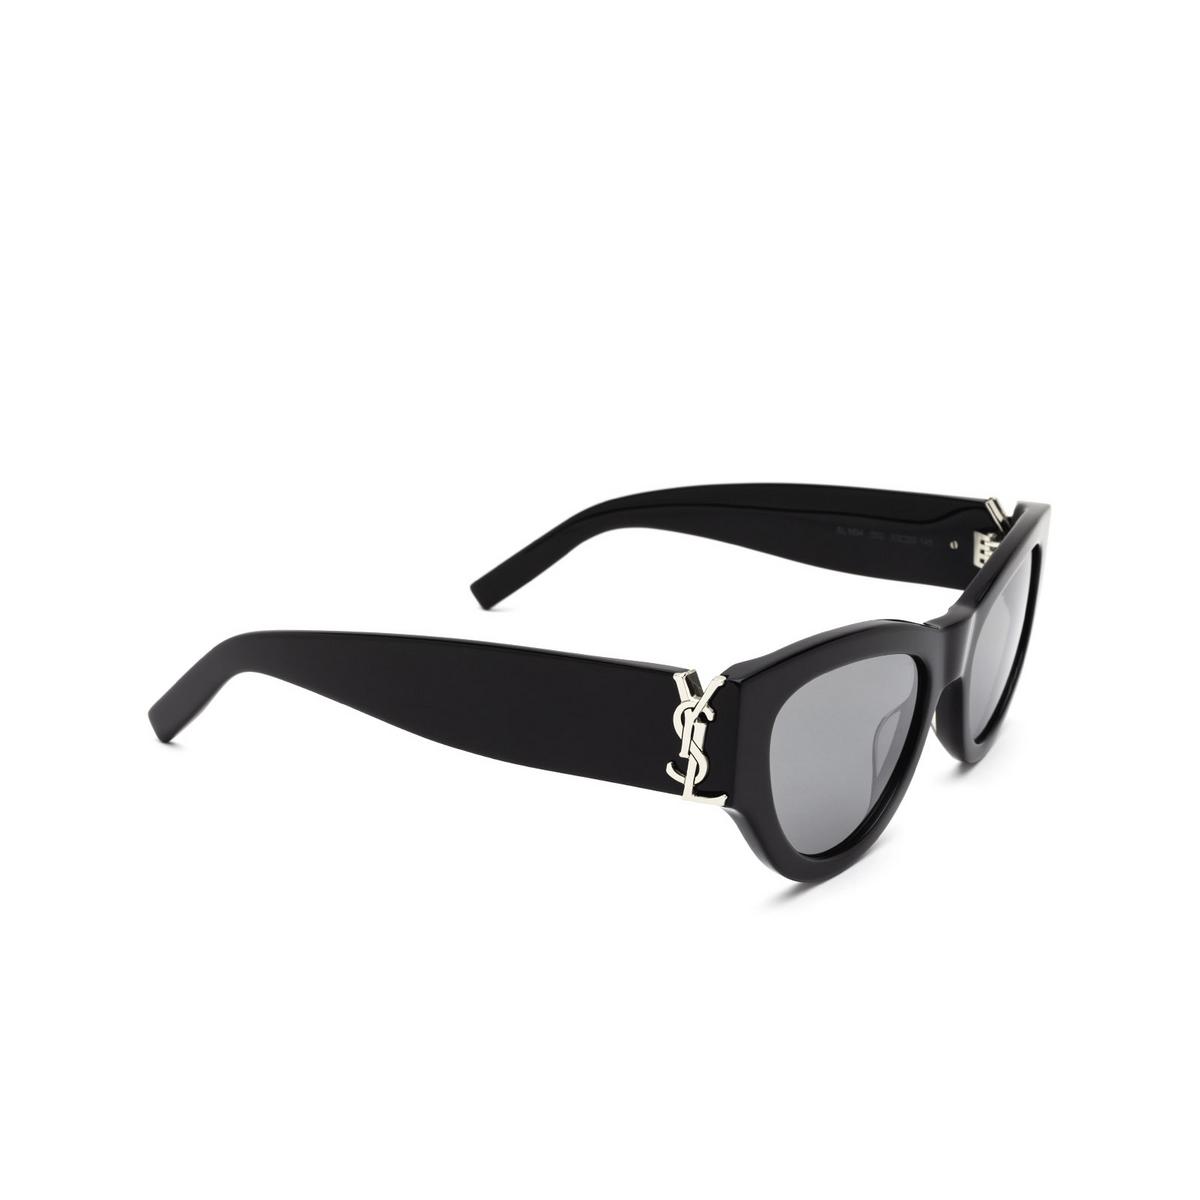 Saint Laurent® Cat-eye Sunglasses: SL M94 color Black 002 - three-quarters view.